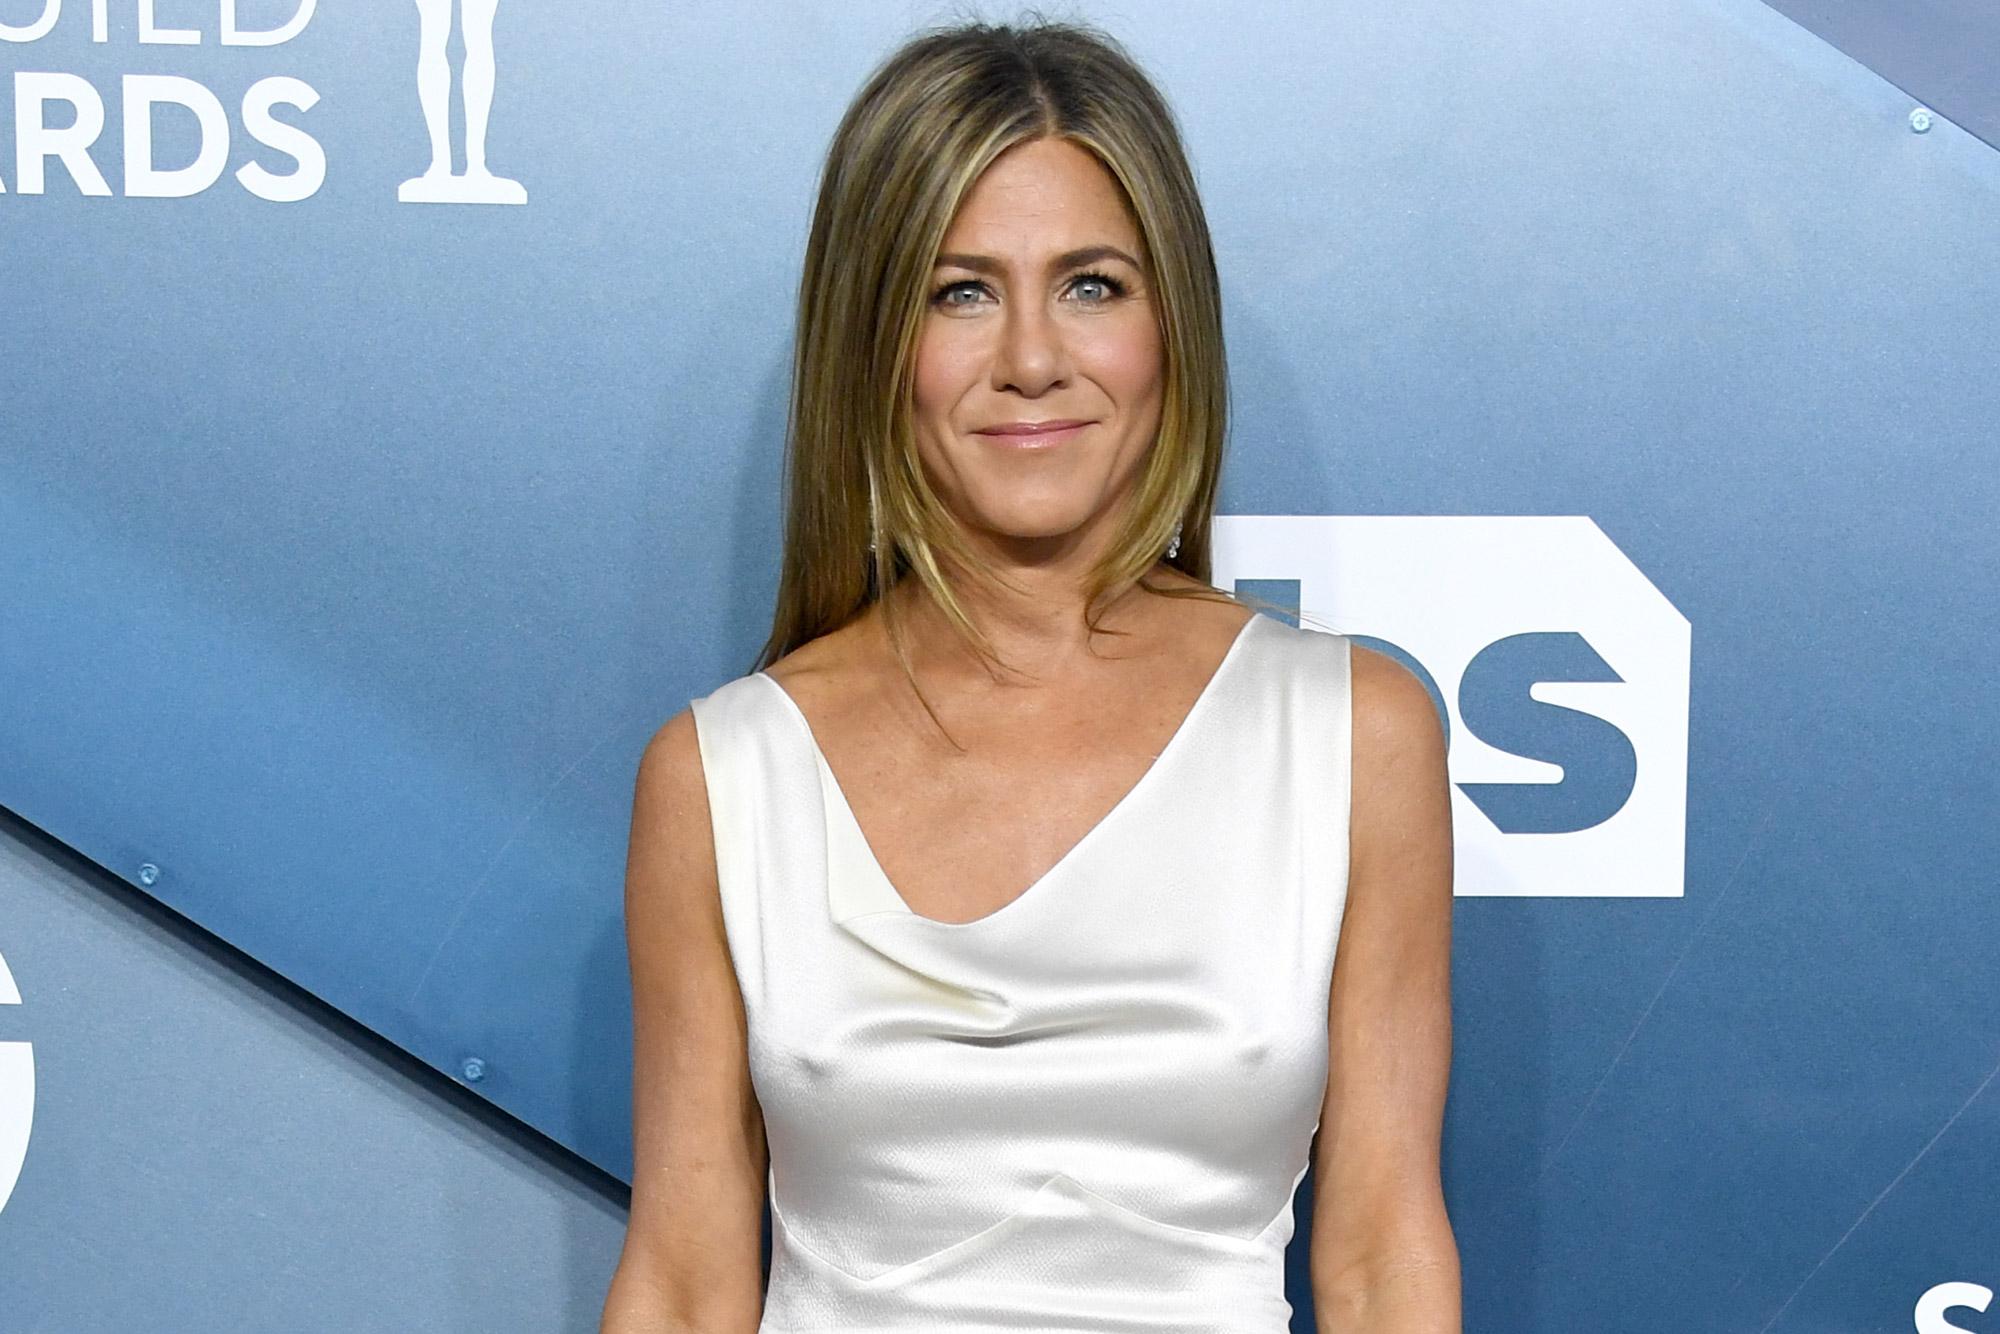 Jennifer Aniston S Sag Awards 2020 Dress Leaves Little To The Imagination